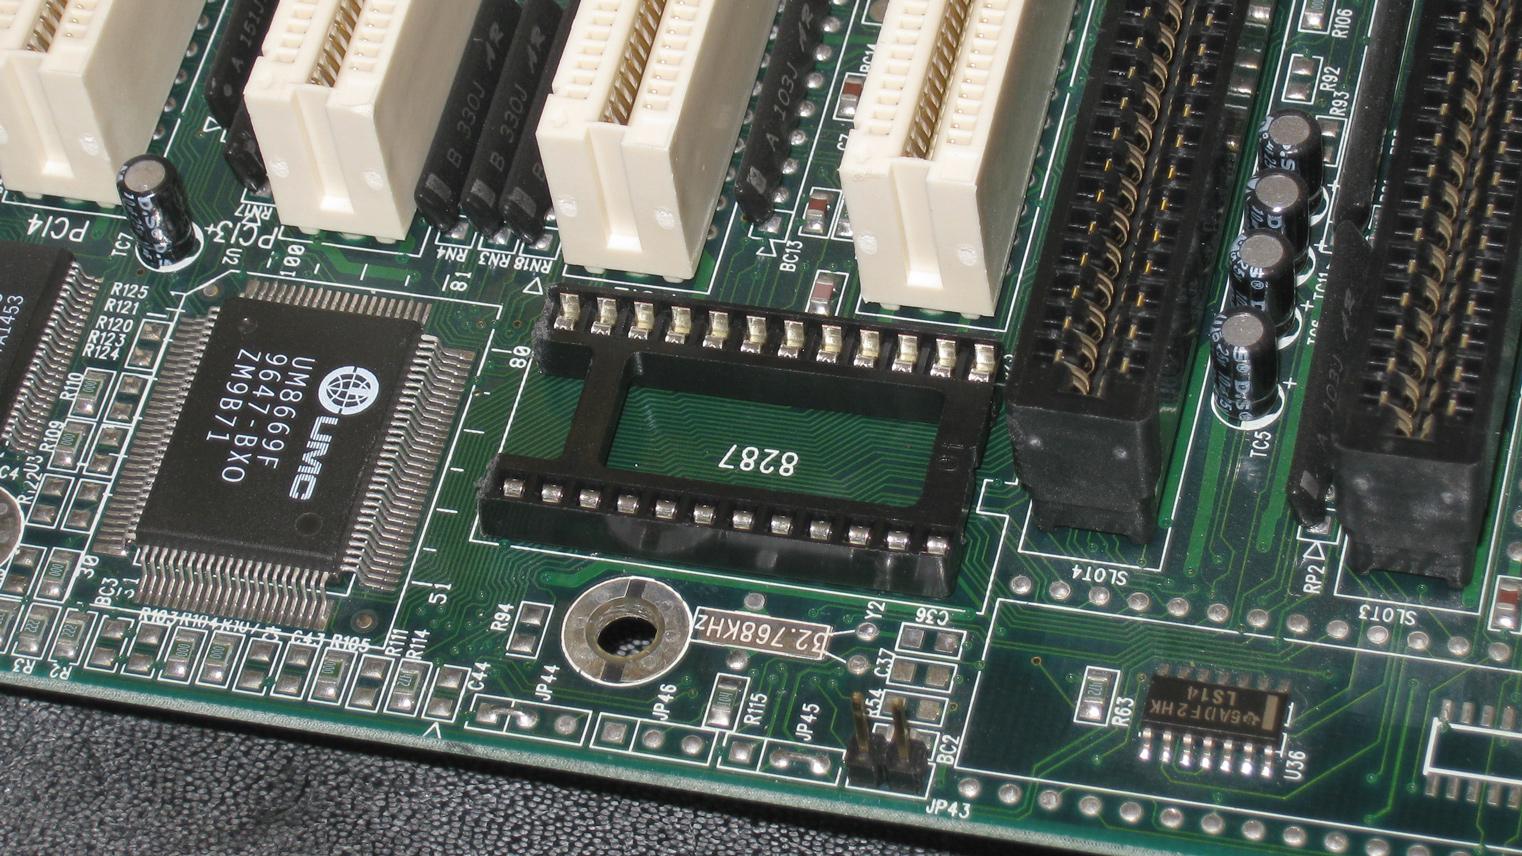 DextersLab2013: Dallas DS12887A NVRAM PC CMOS External